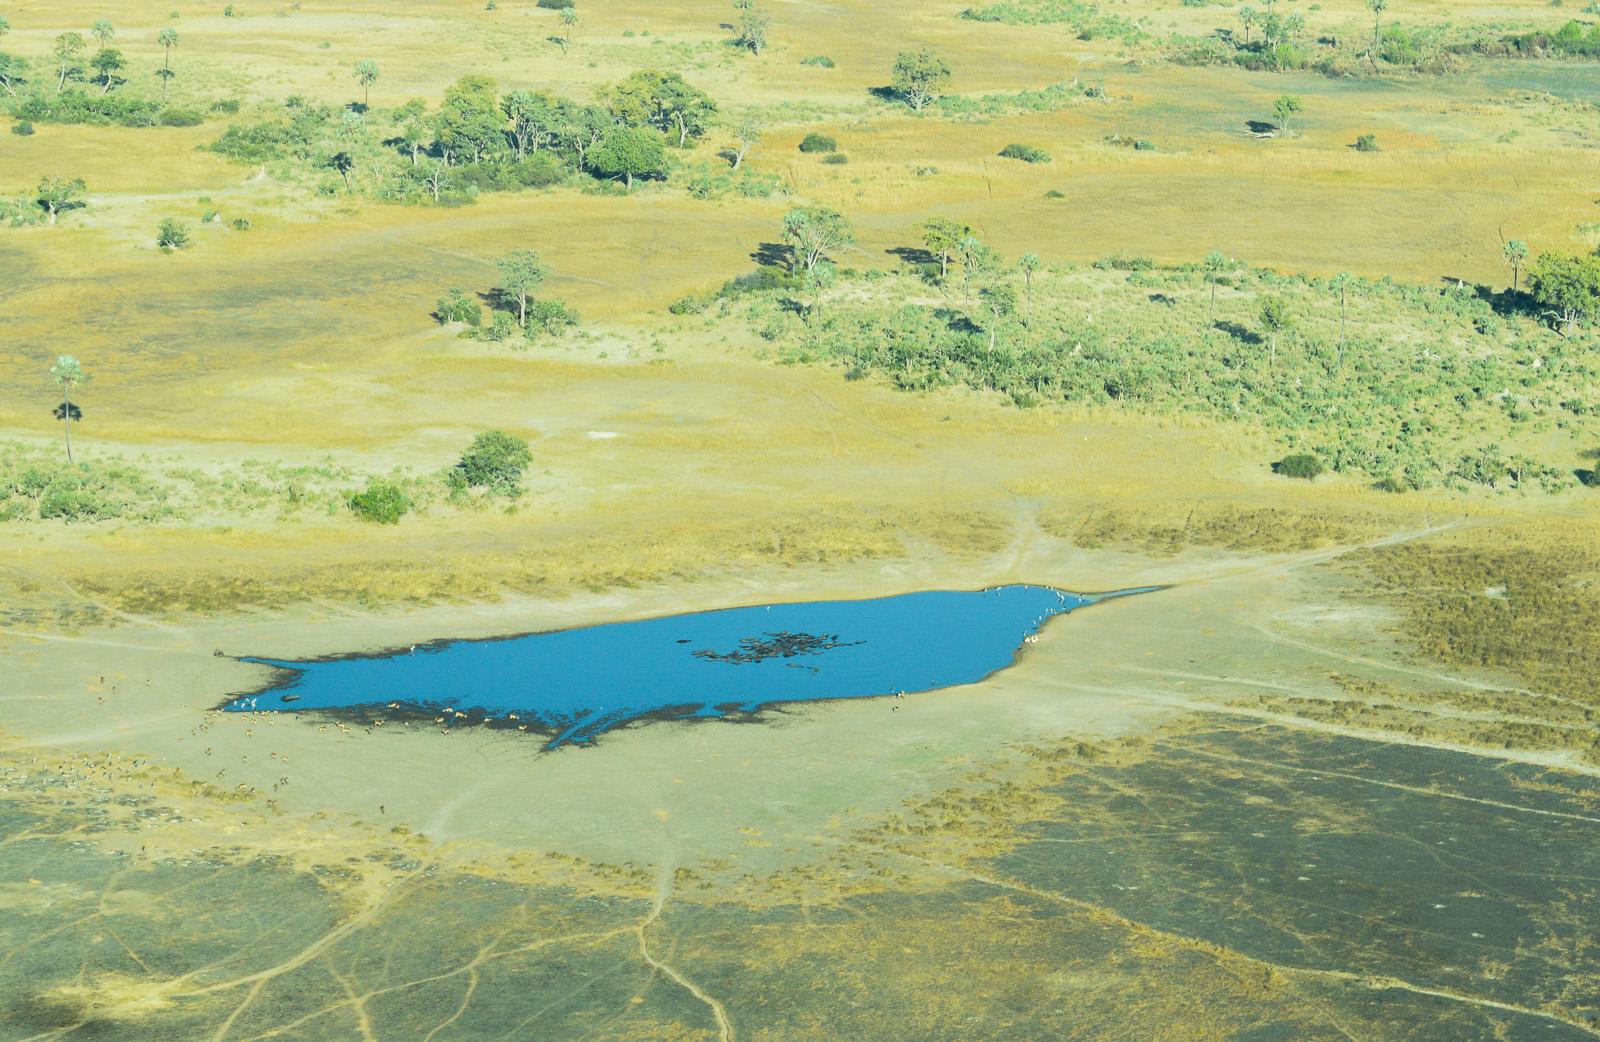 Botswana Rundflug Okavango Delta